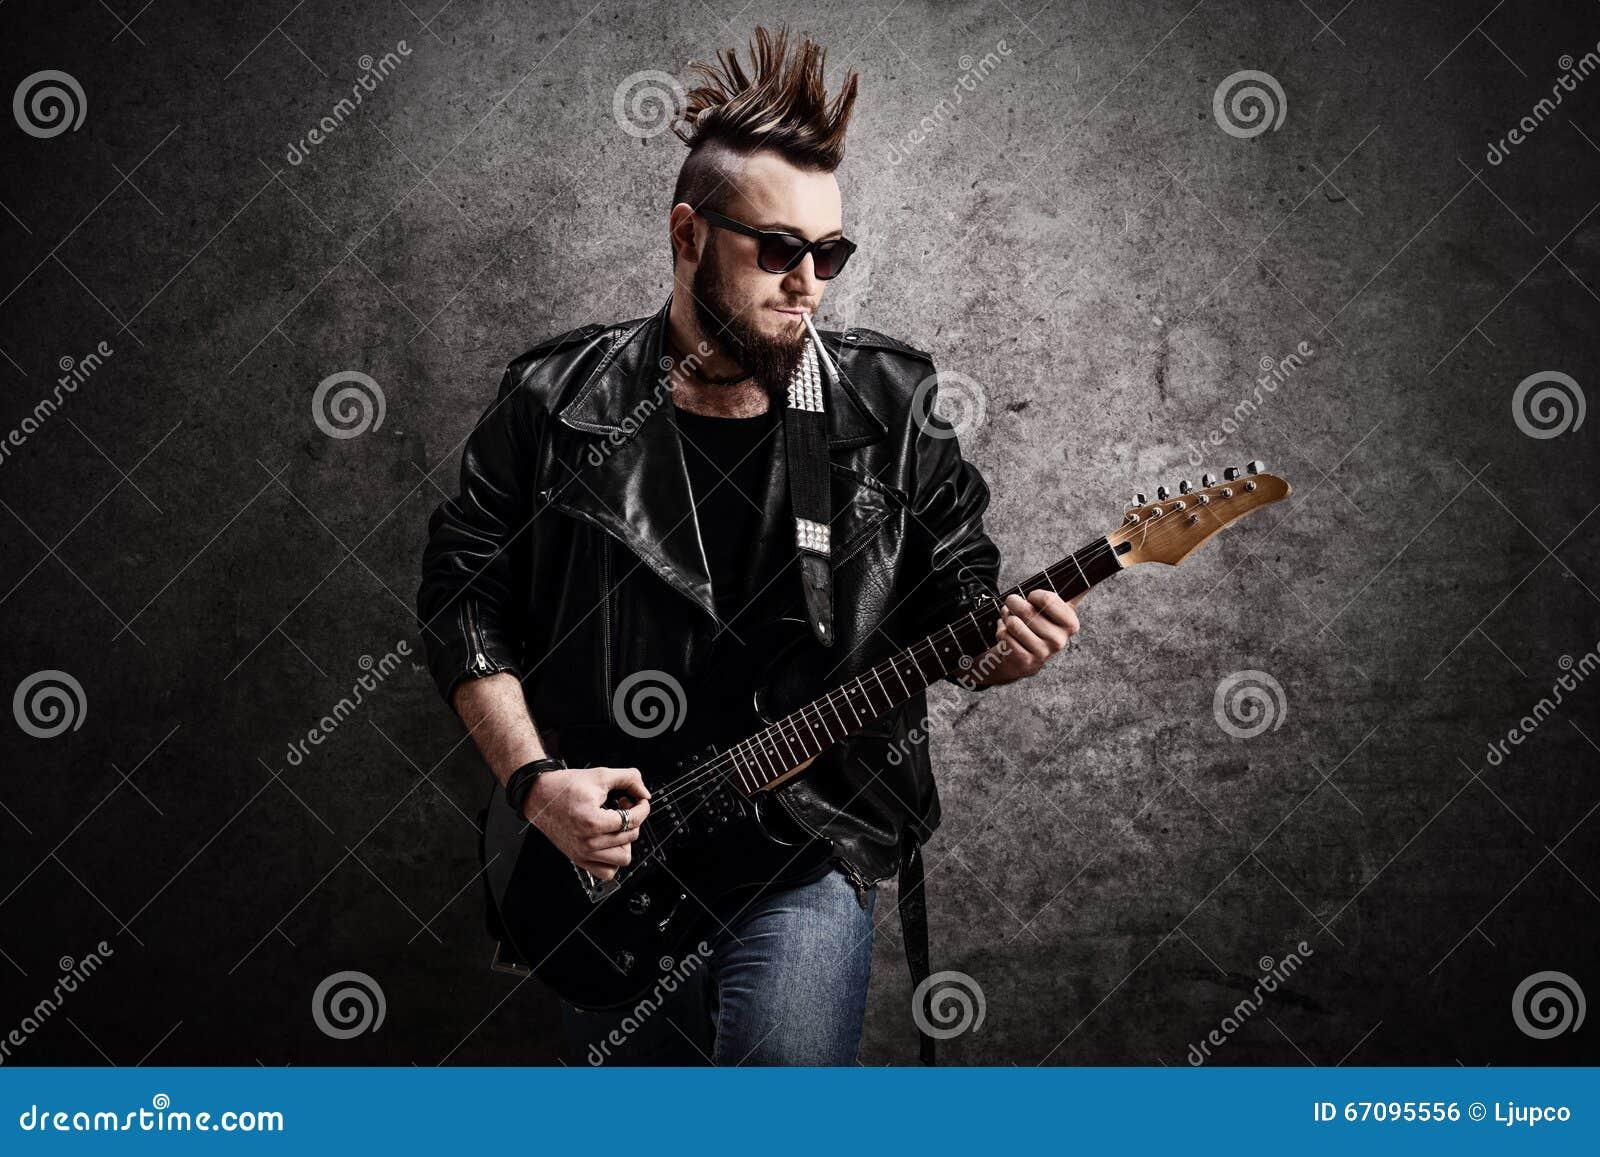 Young Punk Rocker Playing Electric Guitar Stock Photo